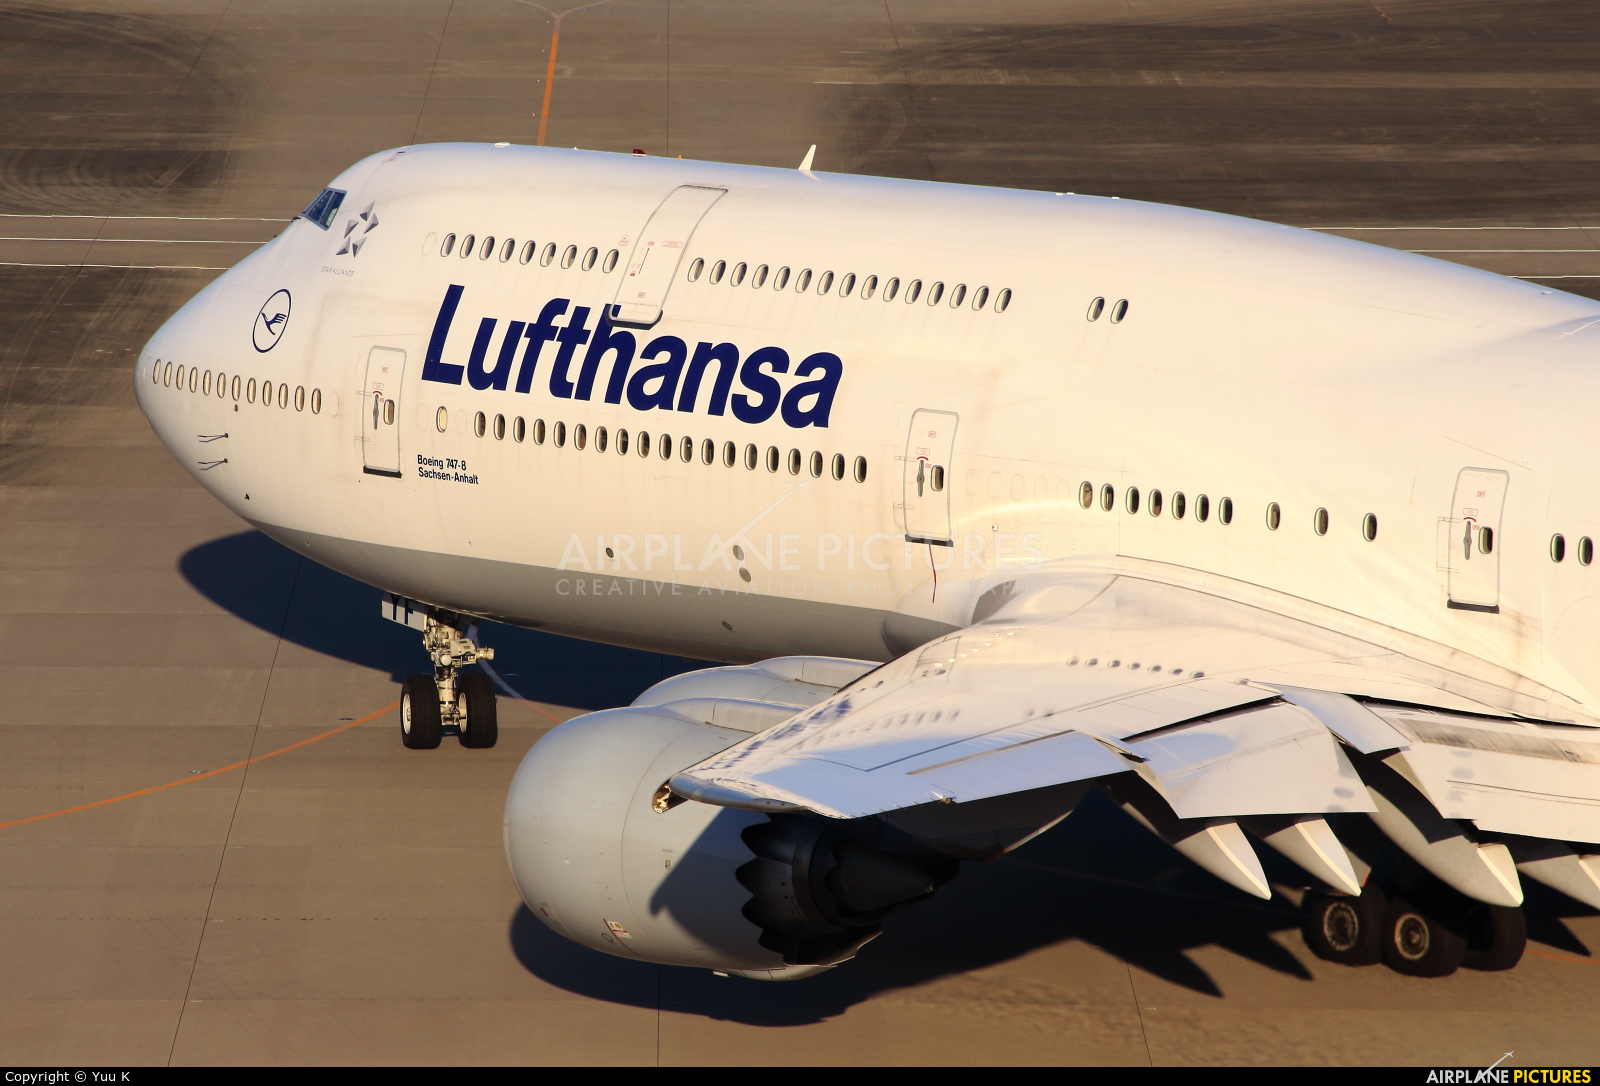 Lufthansa D-ABYF aircraft at Tokyo - Haneda Intl